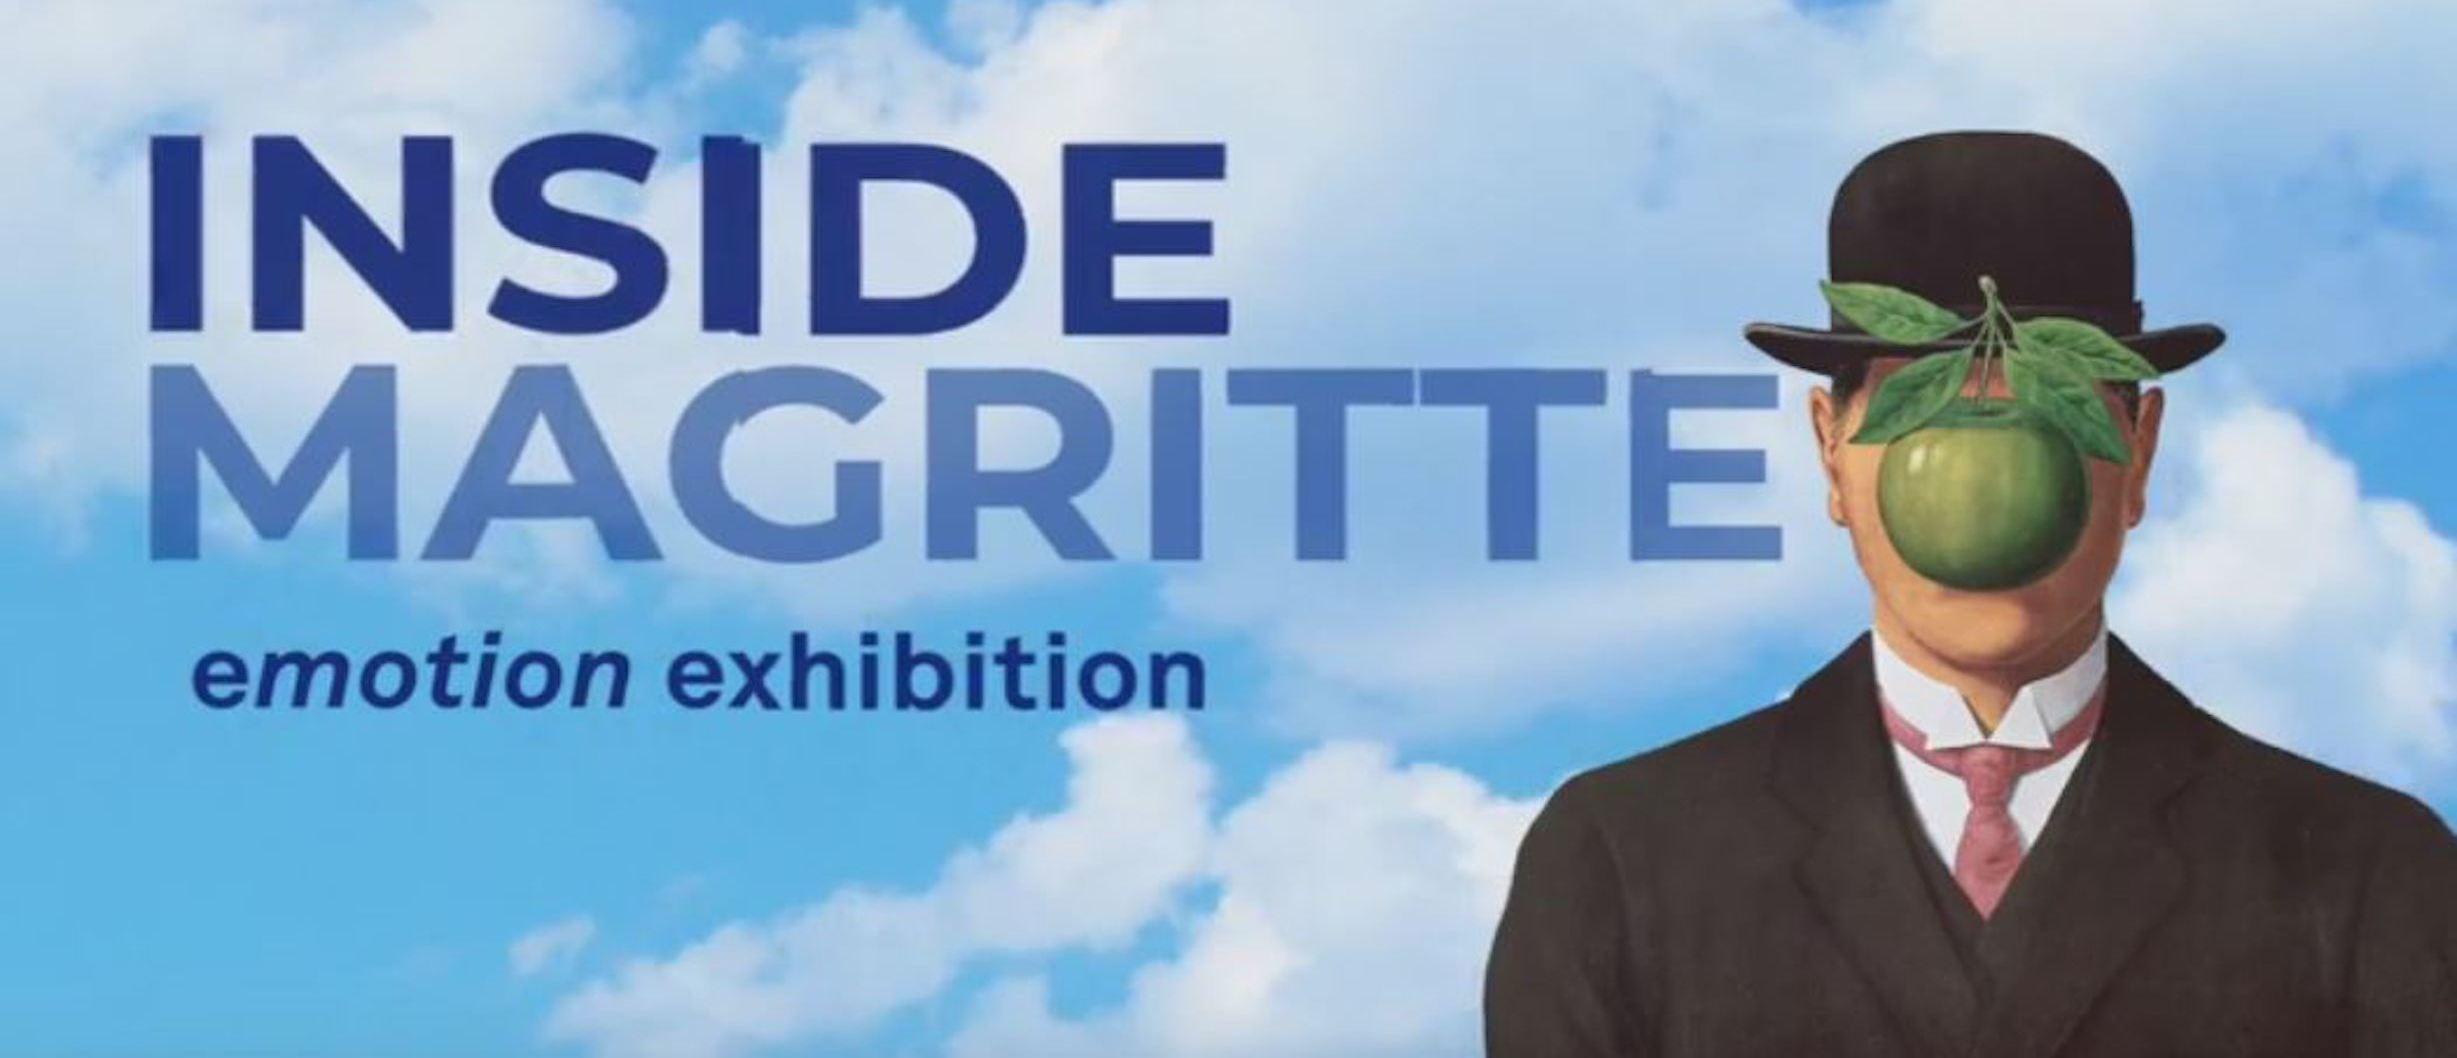 —annullata— Inside Magritte – Santo Stefano al Ponte, Firenze (Firenze)